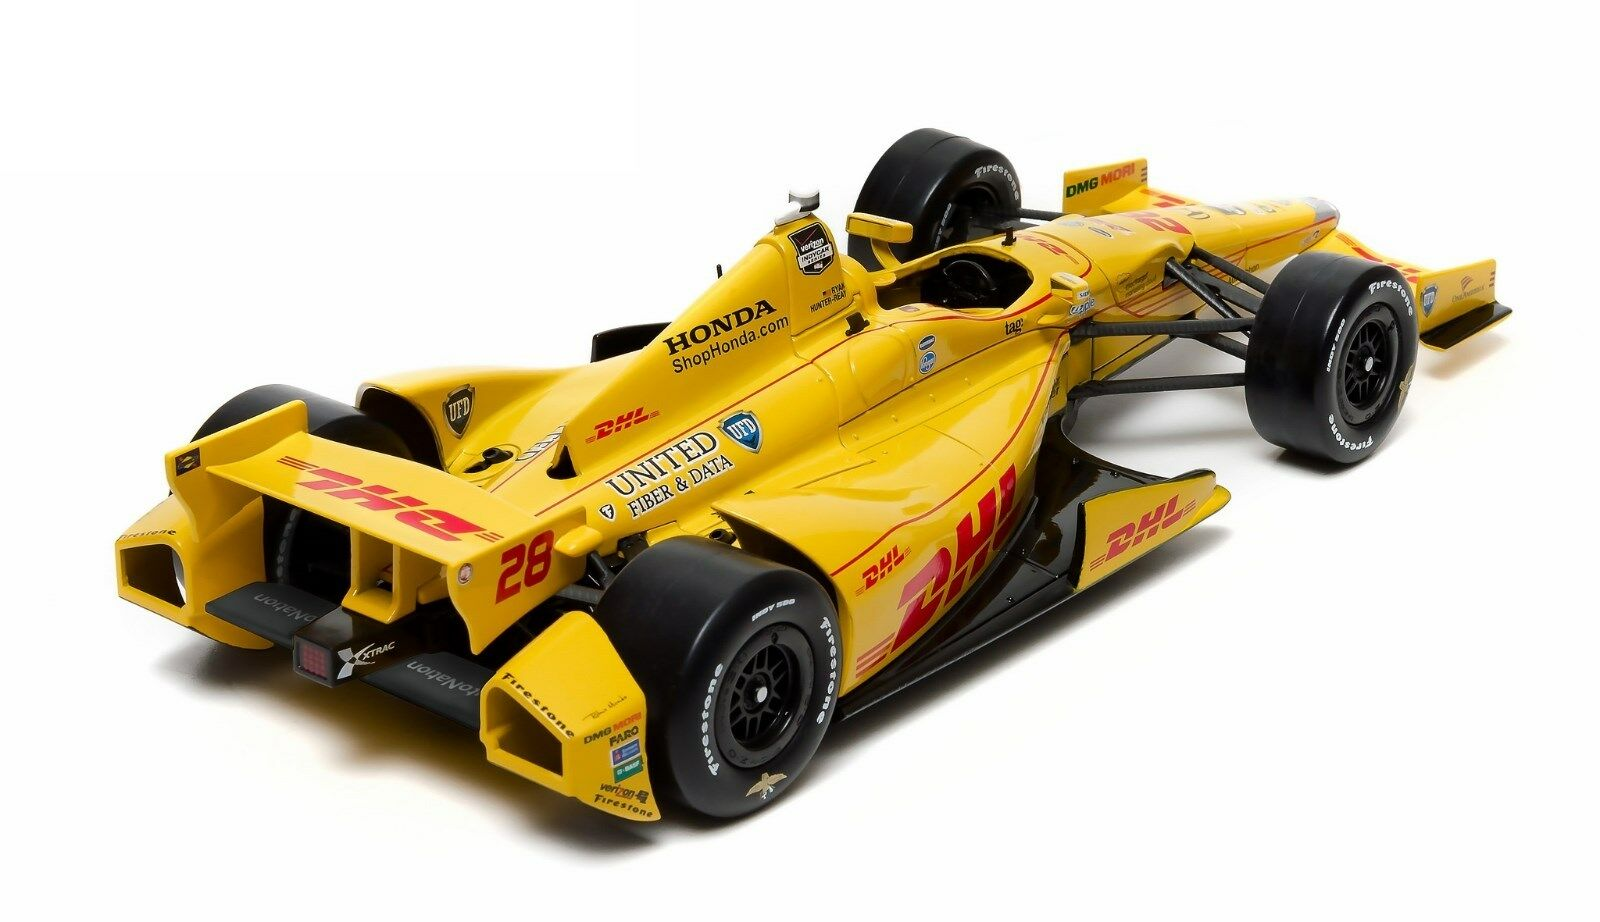 Reay Andretti Autosport Dhl Diecast Model Car 1 18 10957 Ebay